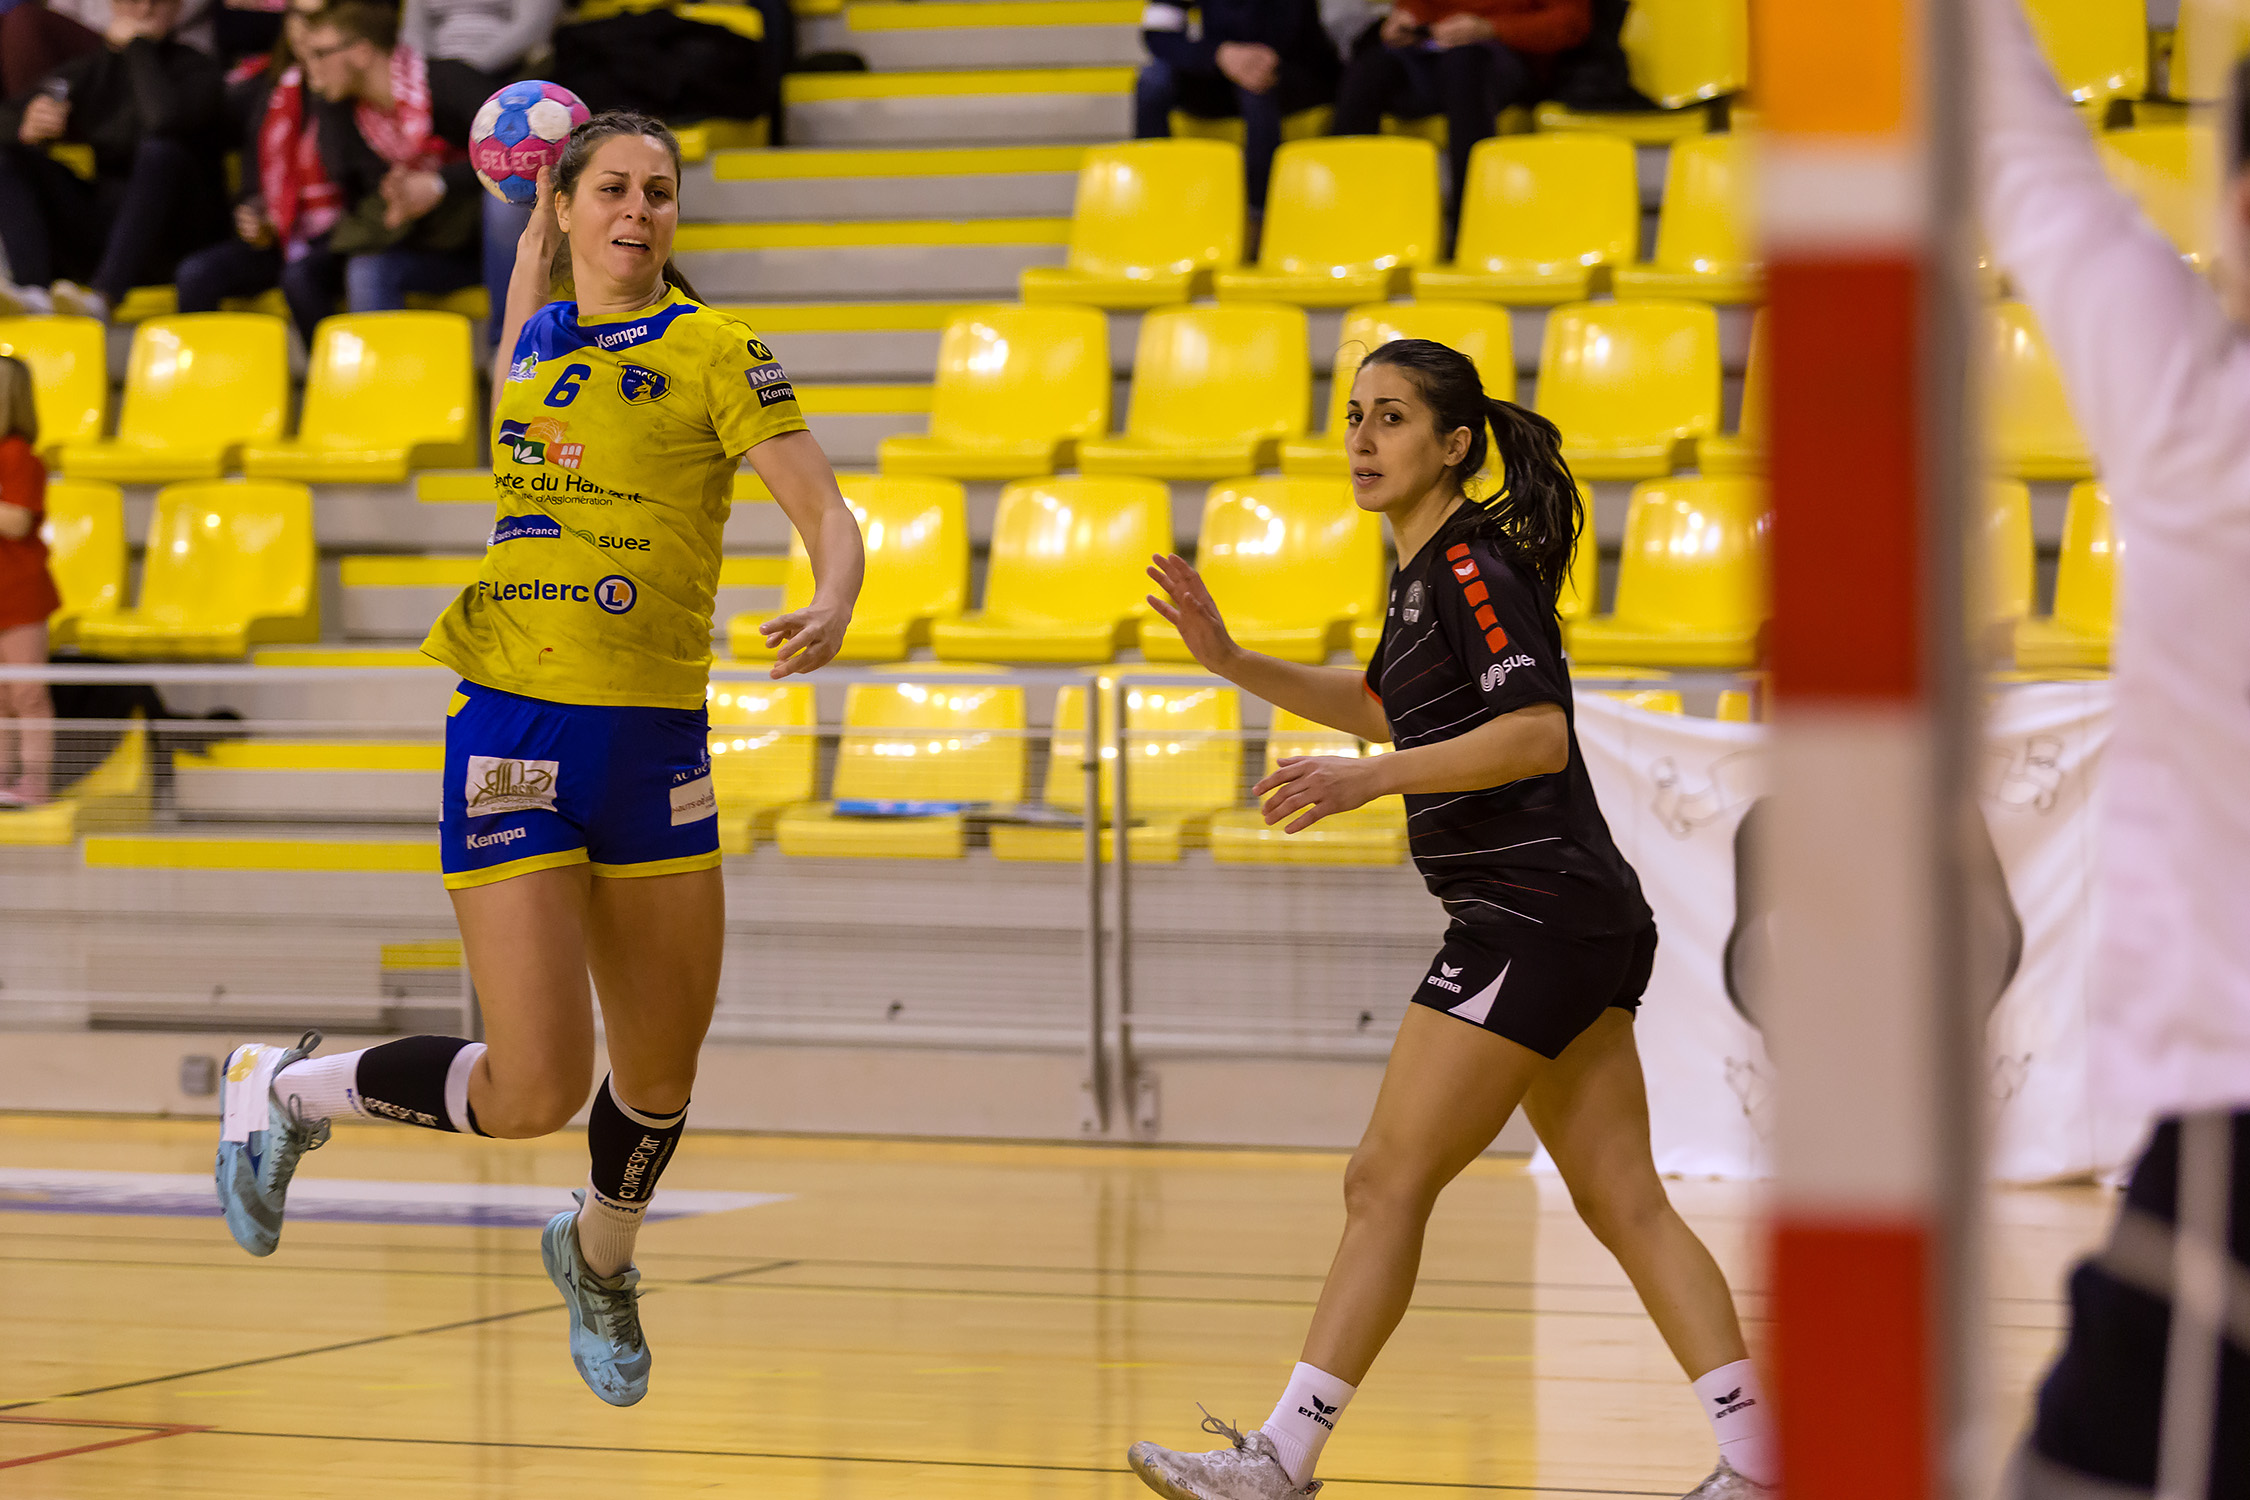 Le Saint-Amand Handball ramène les 3 points d'Achenheim !